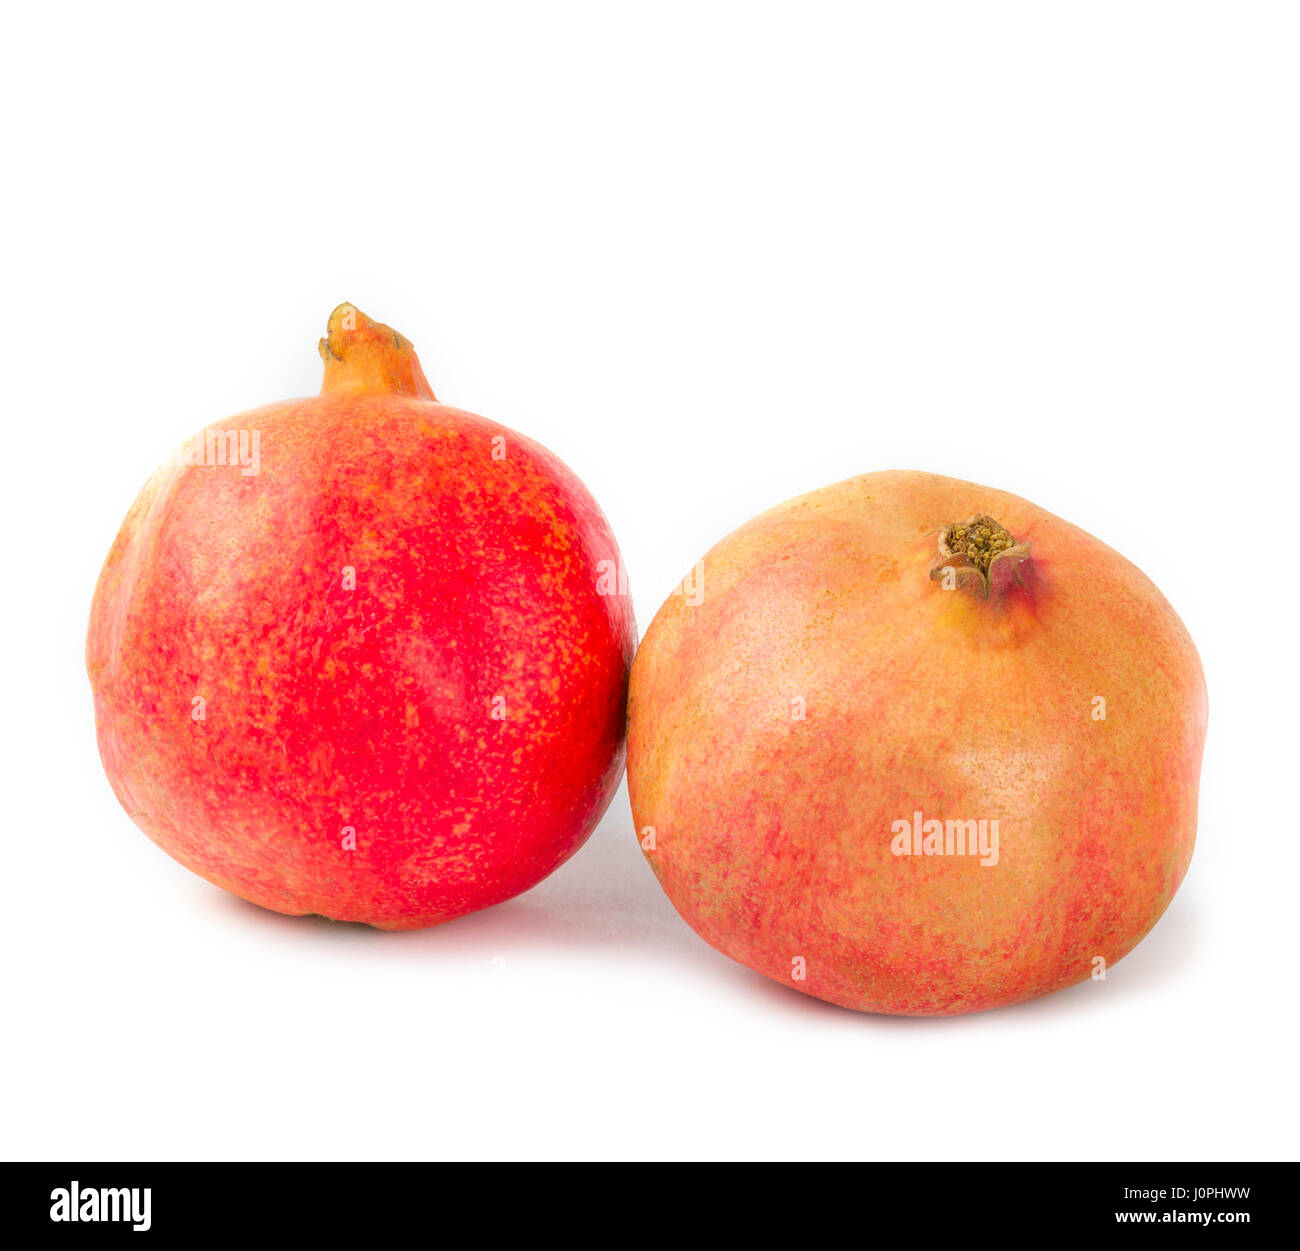 Pomegranate - Stock Image